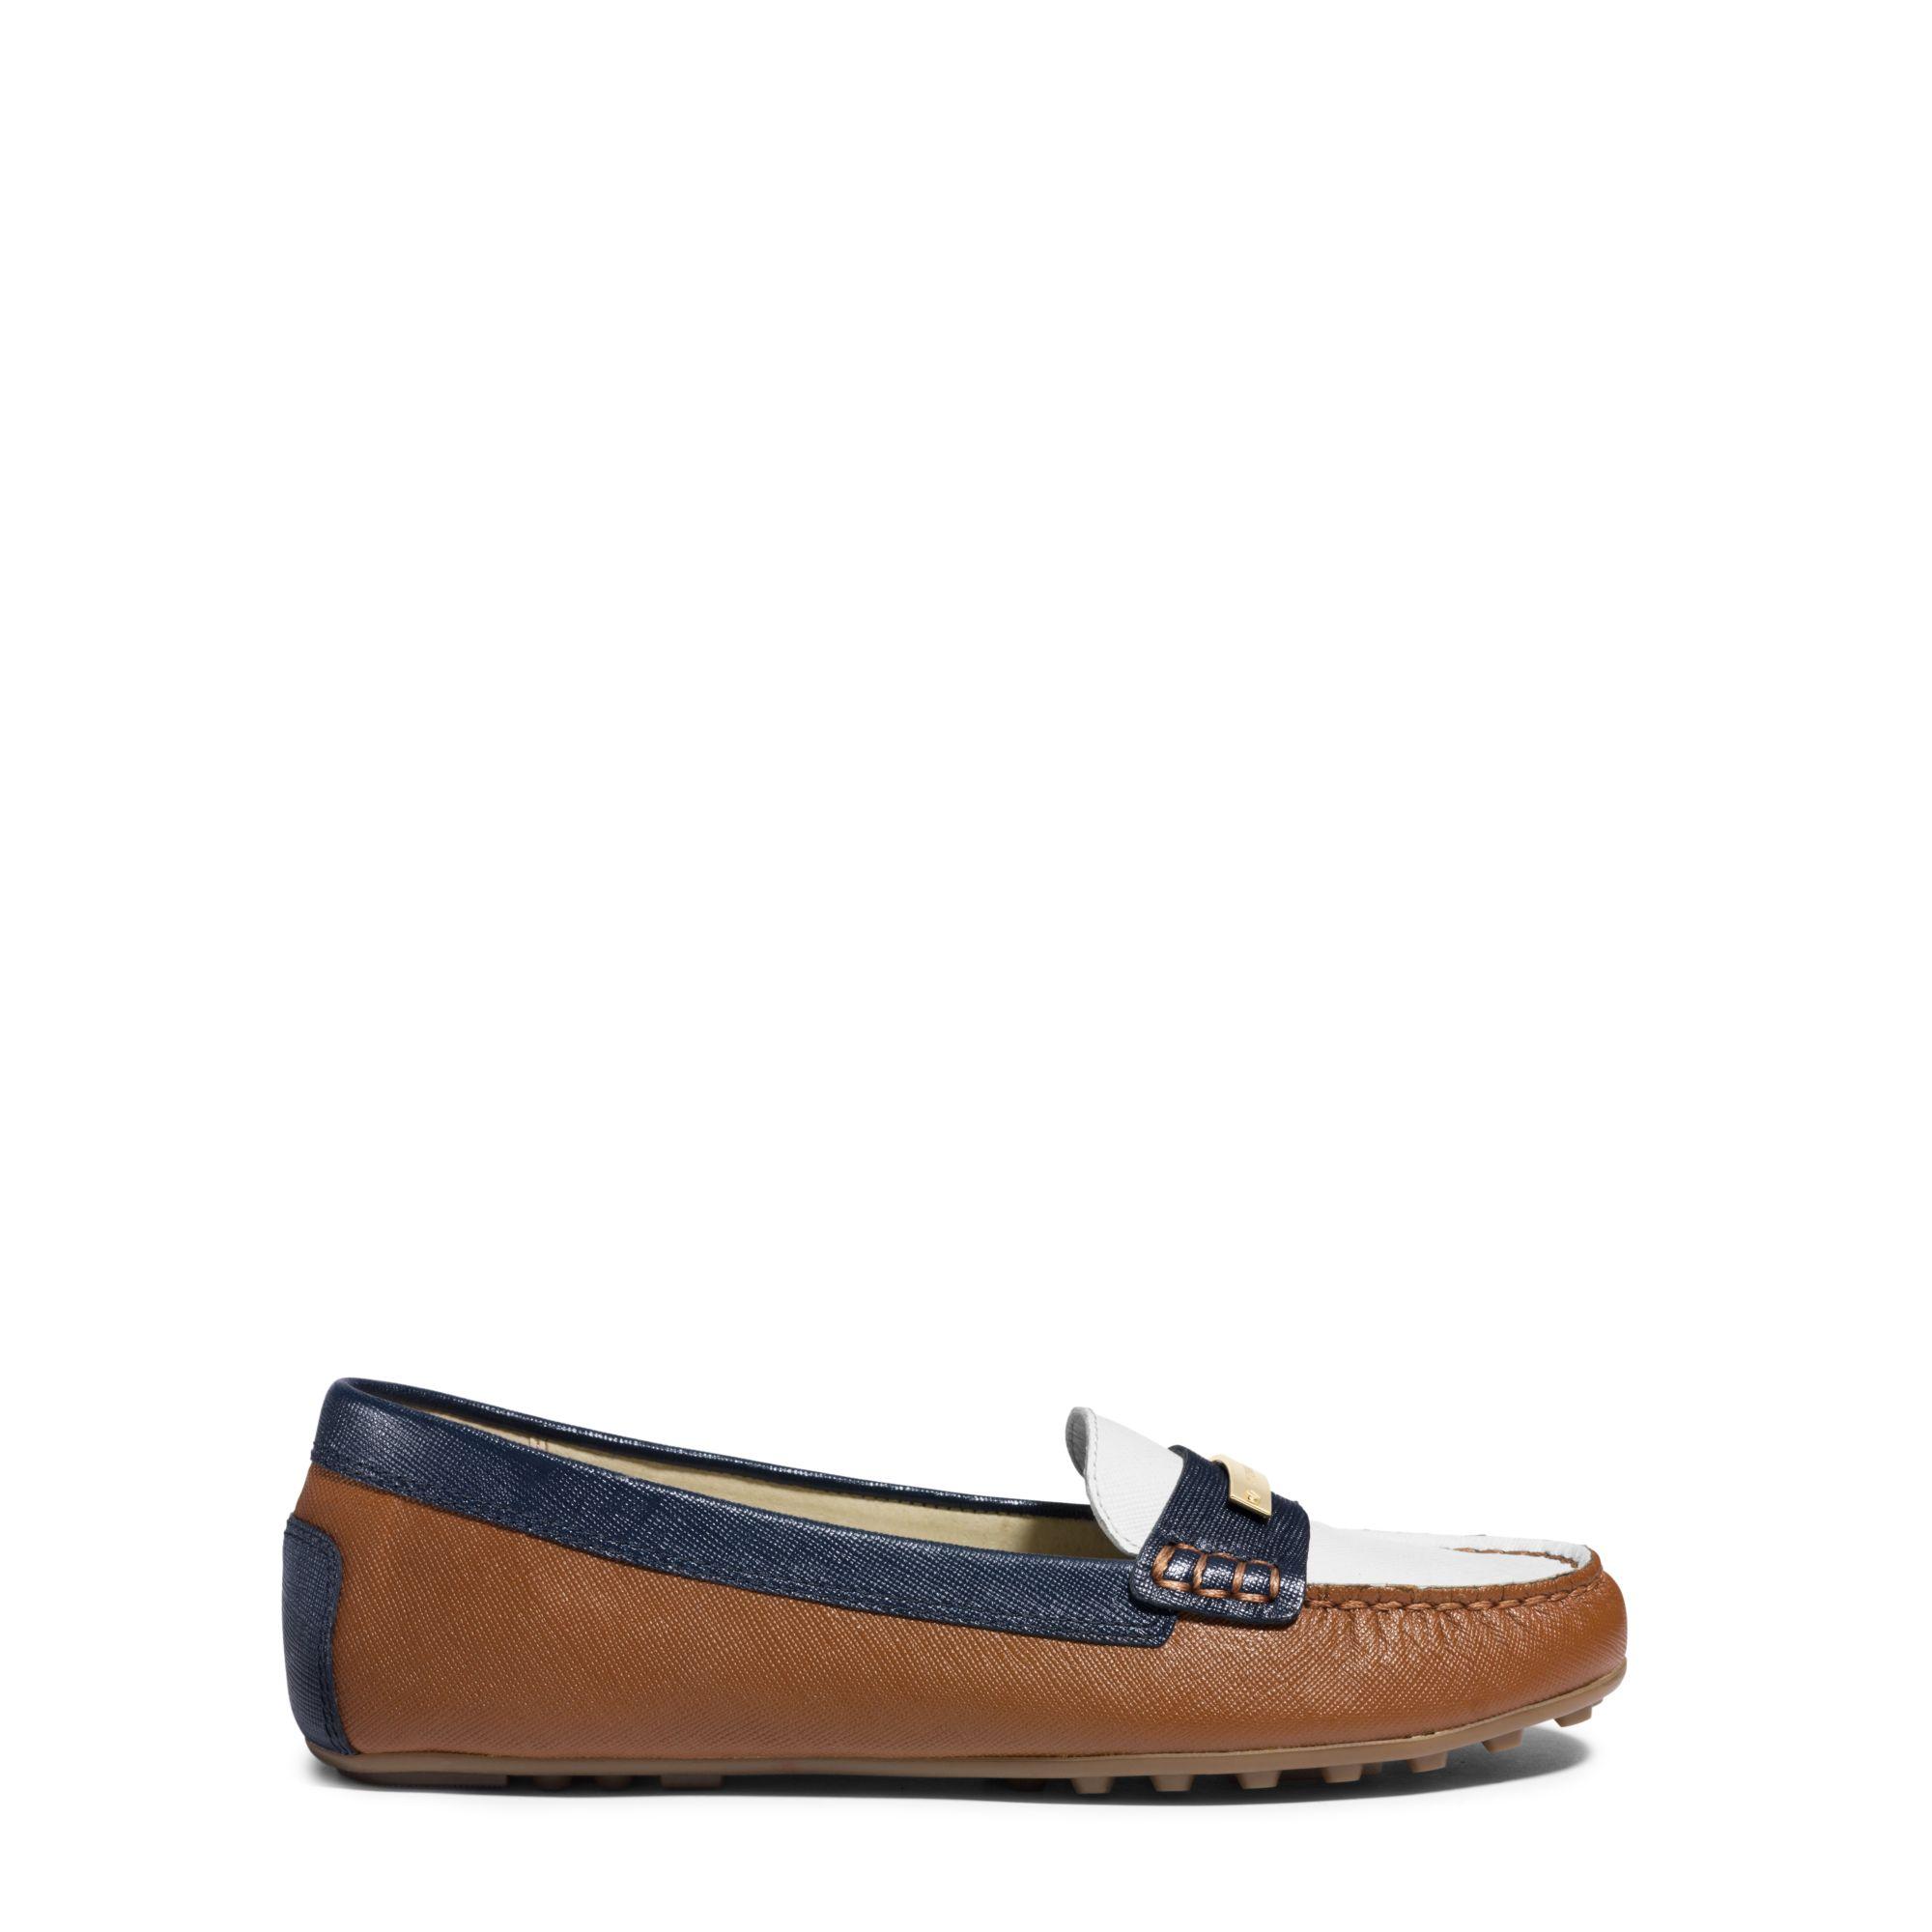 c1e52b1f2b9 Lyst - Michael Kors Everett Saffiano Leather Loafer in Blue